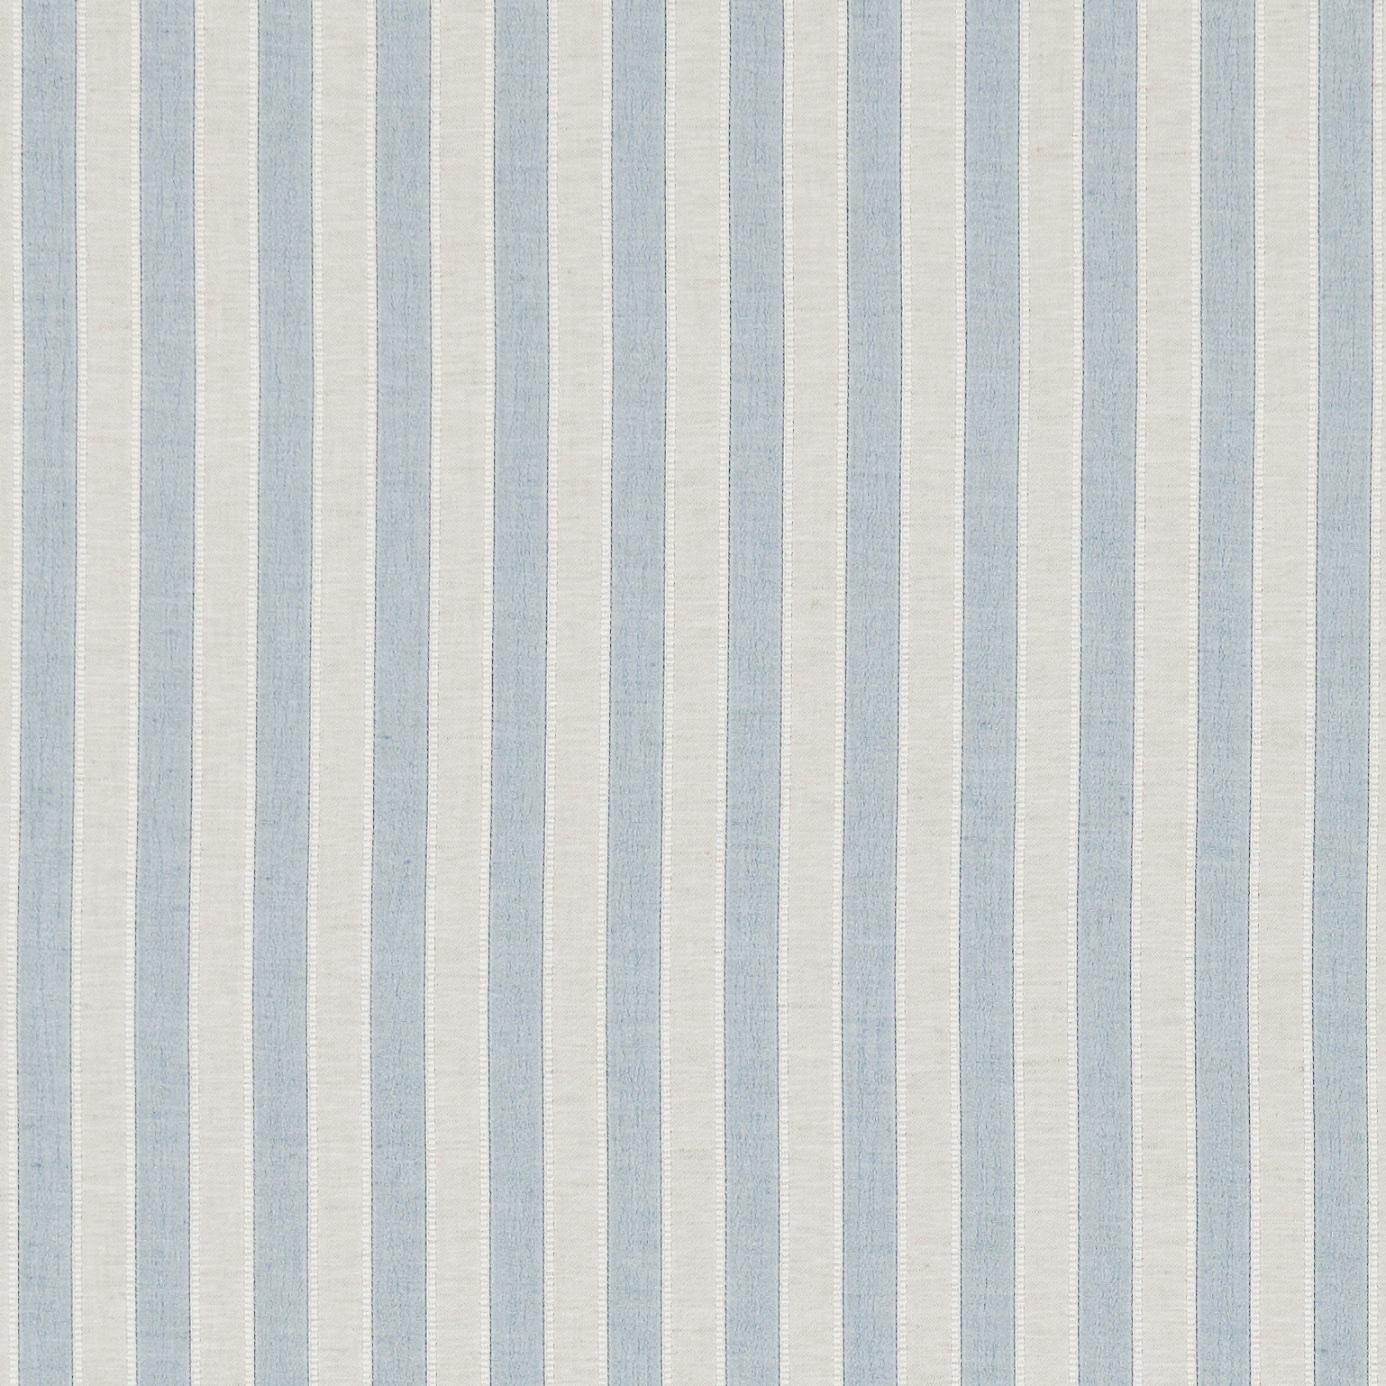 Sanderson Sorilla Damask Curtain Fabric Delft Linen Curtain Factory Outlet